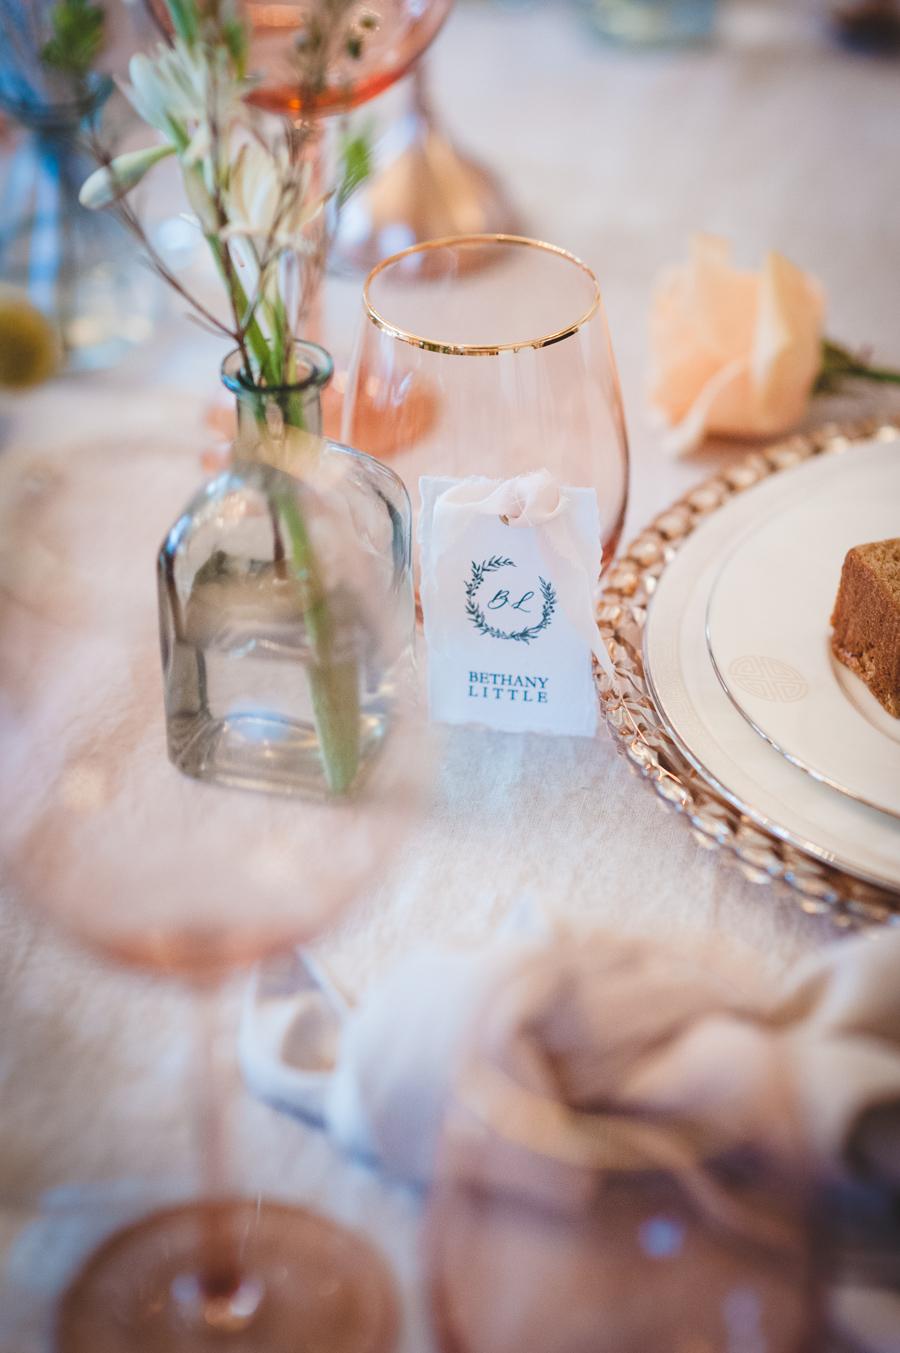 Yorkshire wedding venue styling ideas, photo credit Boho Chic Weddings (2)